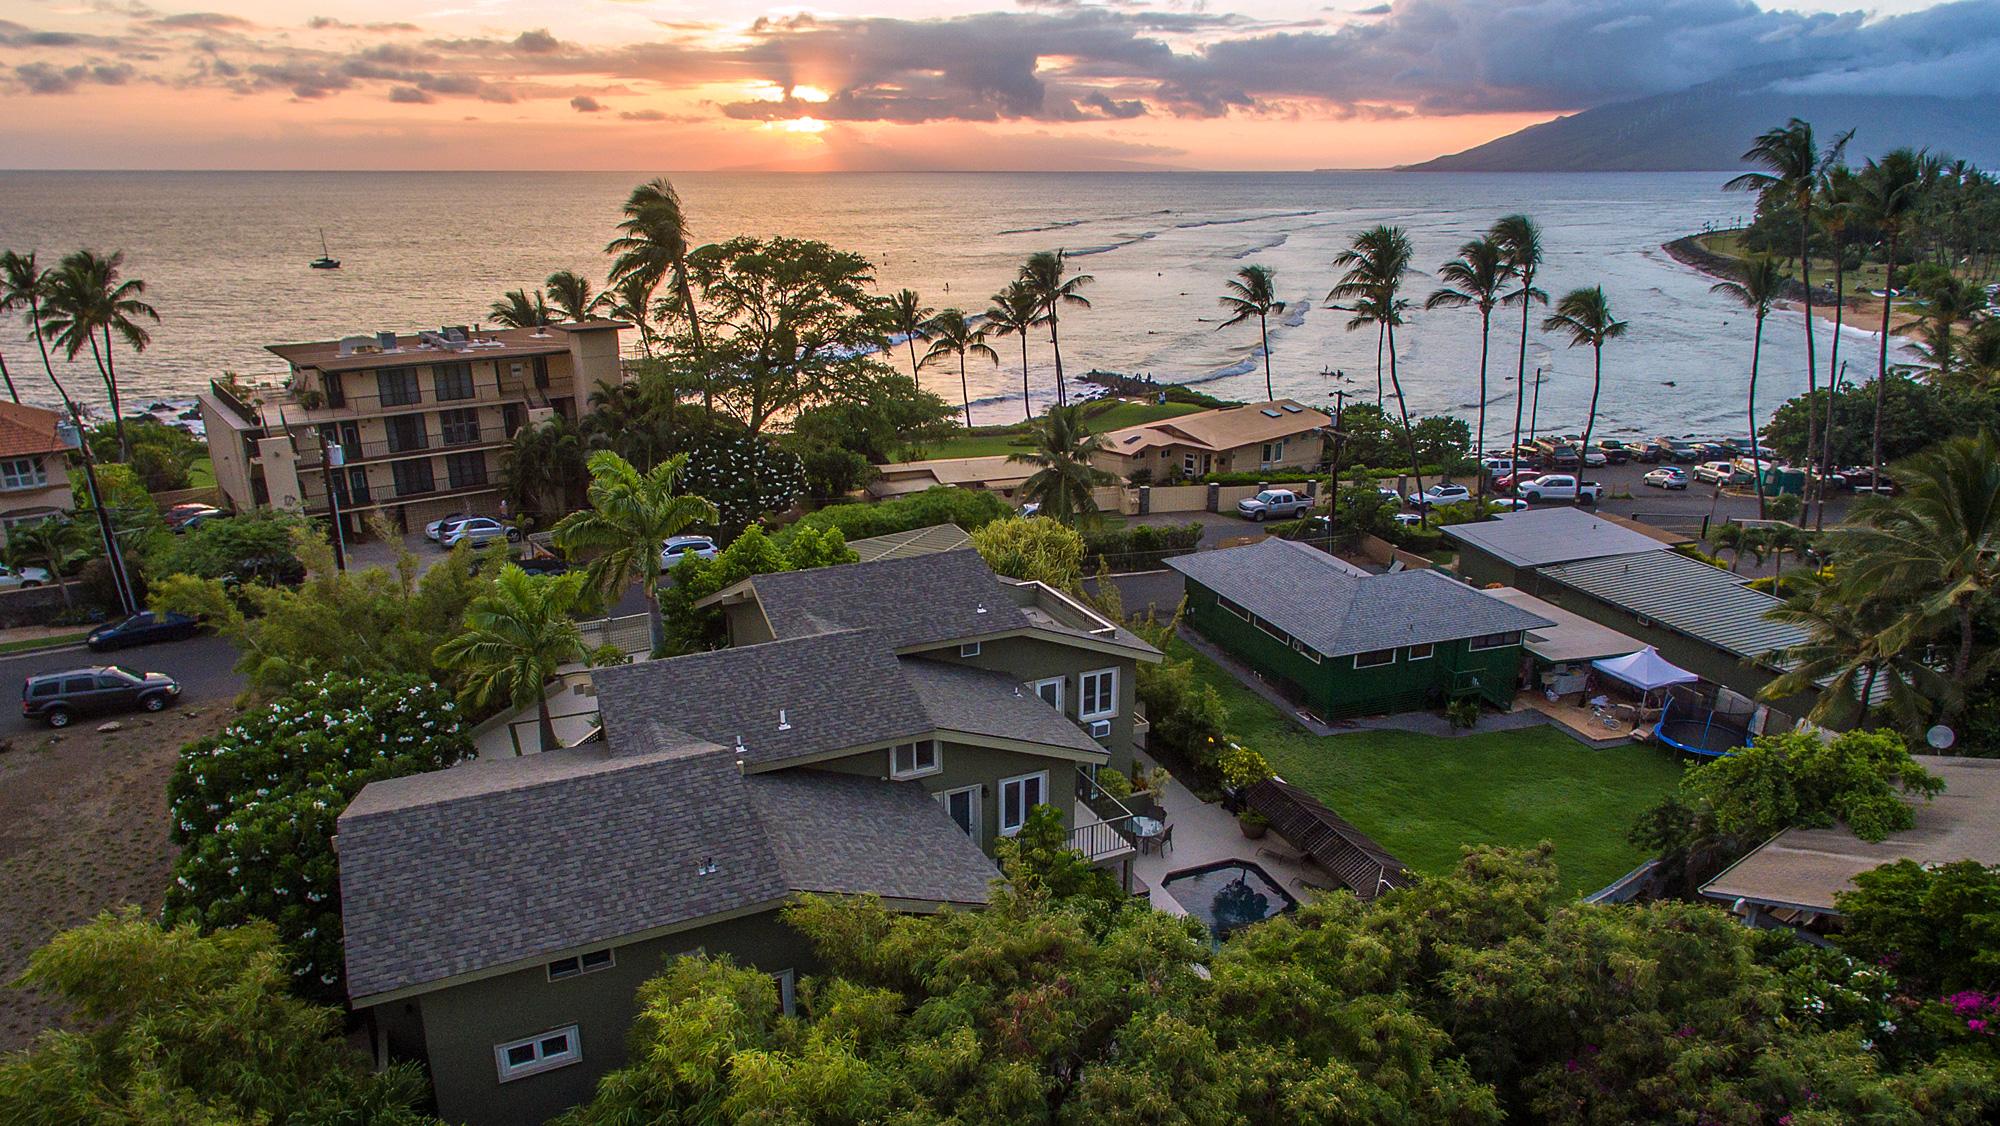 Maui 2020 - Wailea Inn, Kihei, HawaiiFebruary 29 – March 8